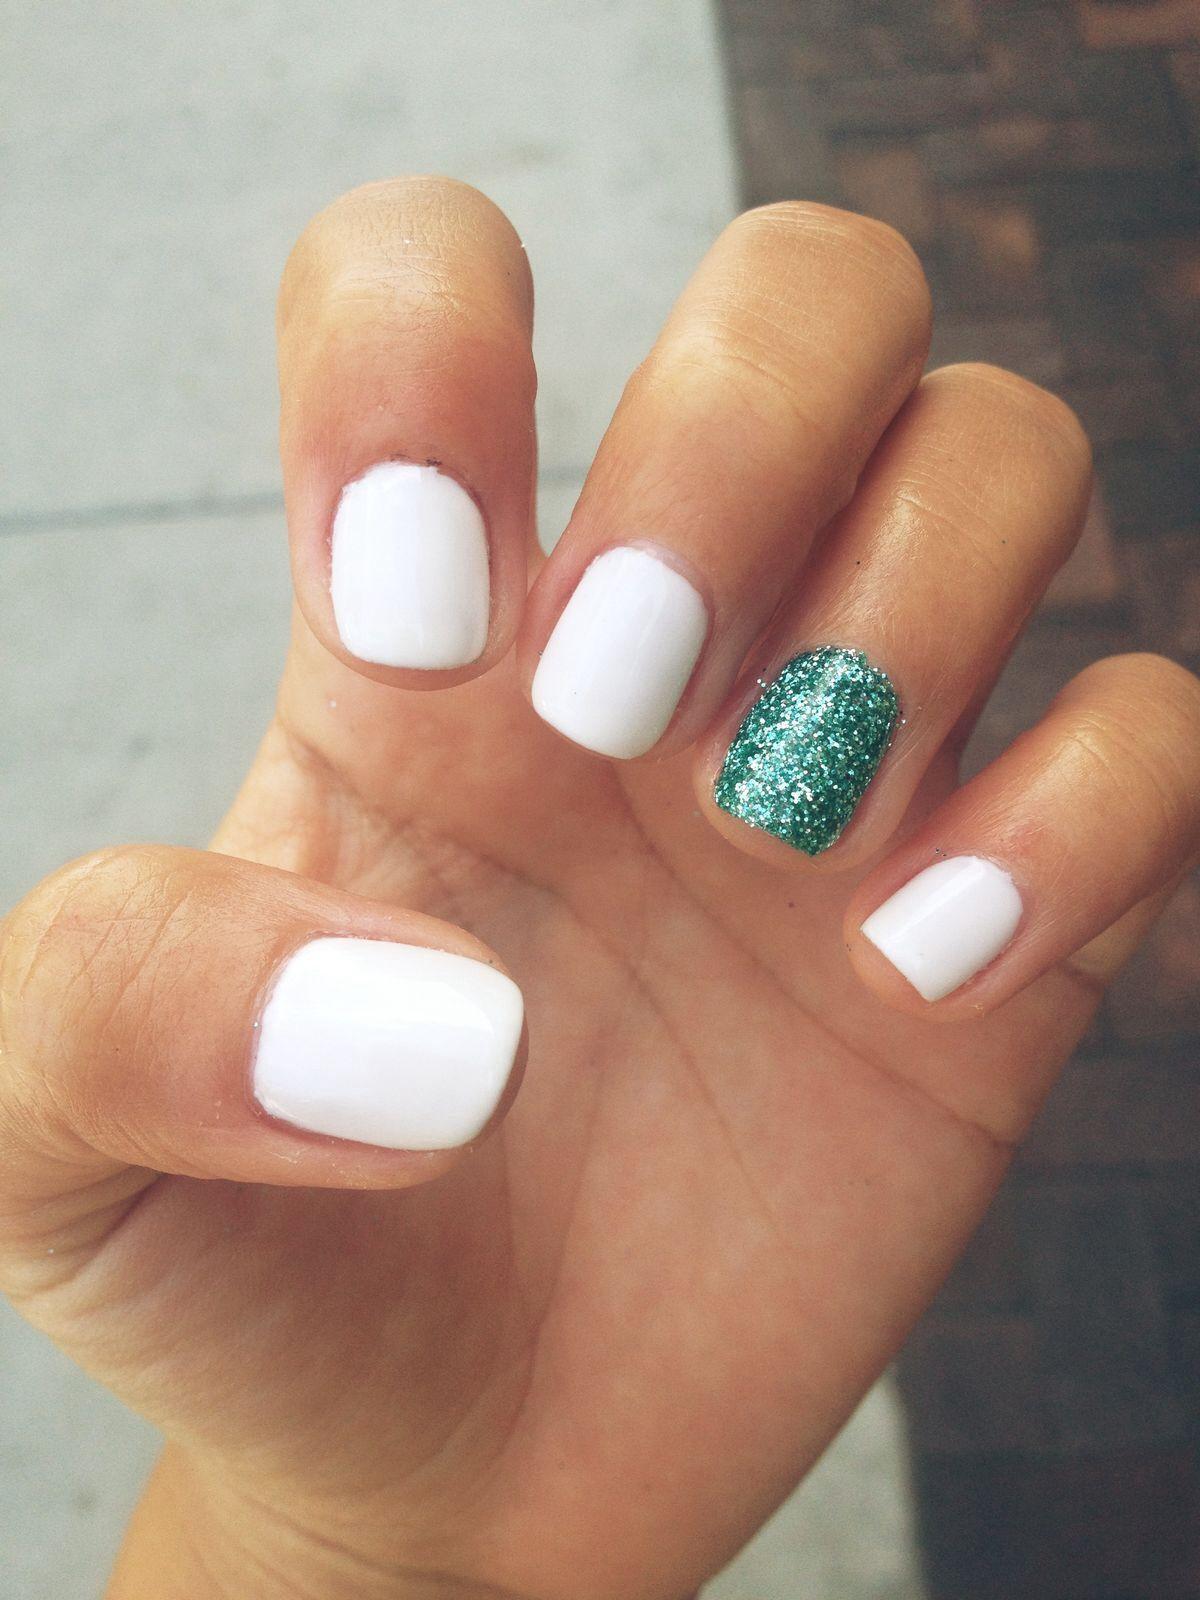 White and turquoise nails fashion pinterest nails nail